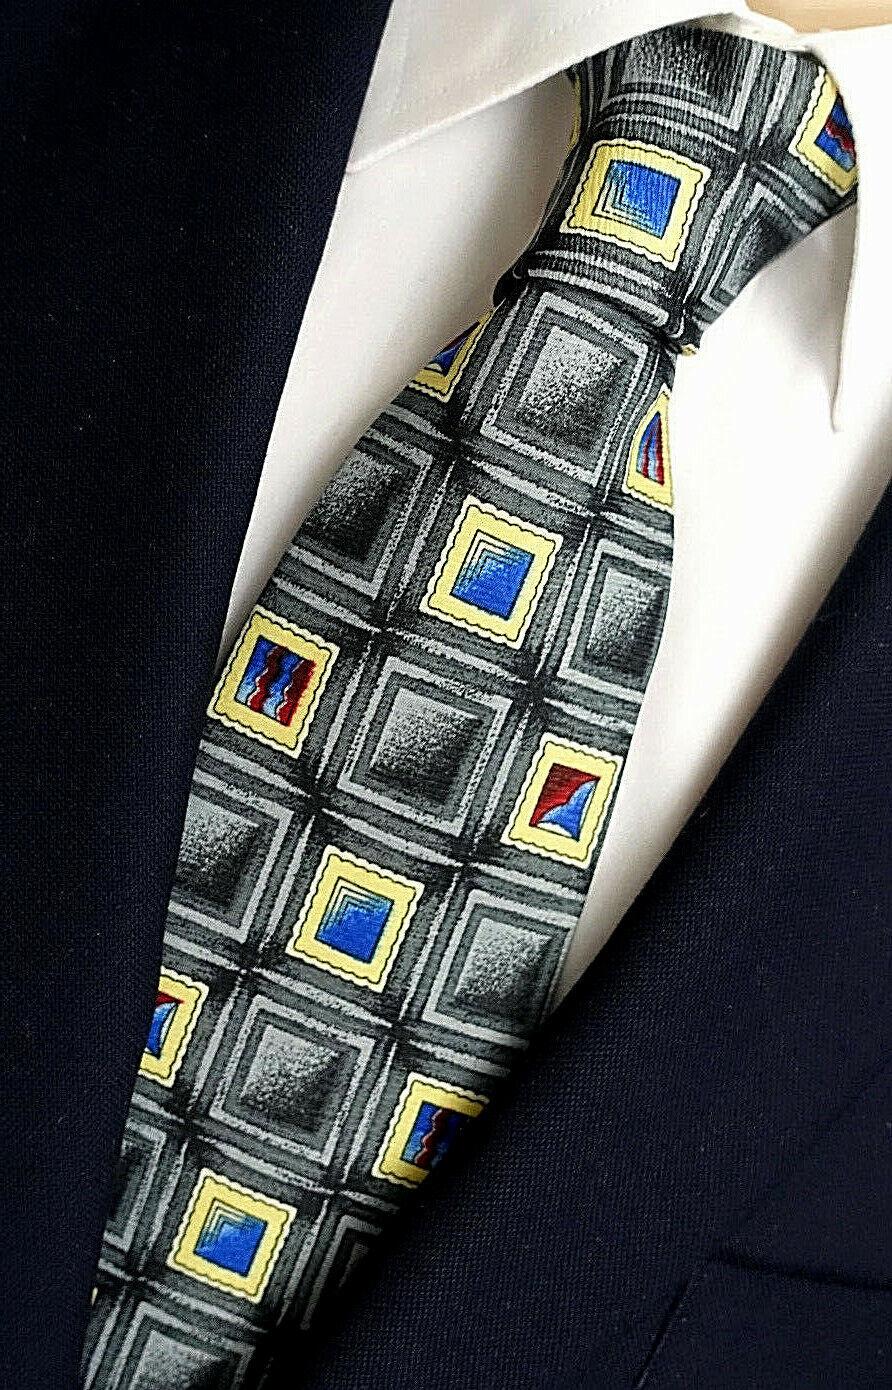 NEU - Jassine Herren Anlass / Business Krawatte - Kachelmuster - Retro-Look TOP